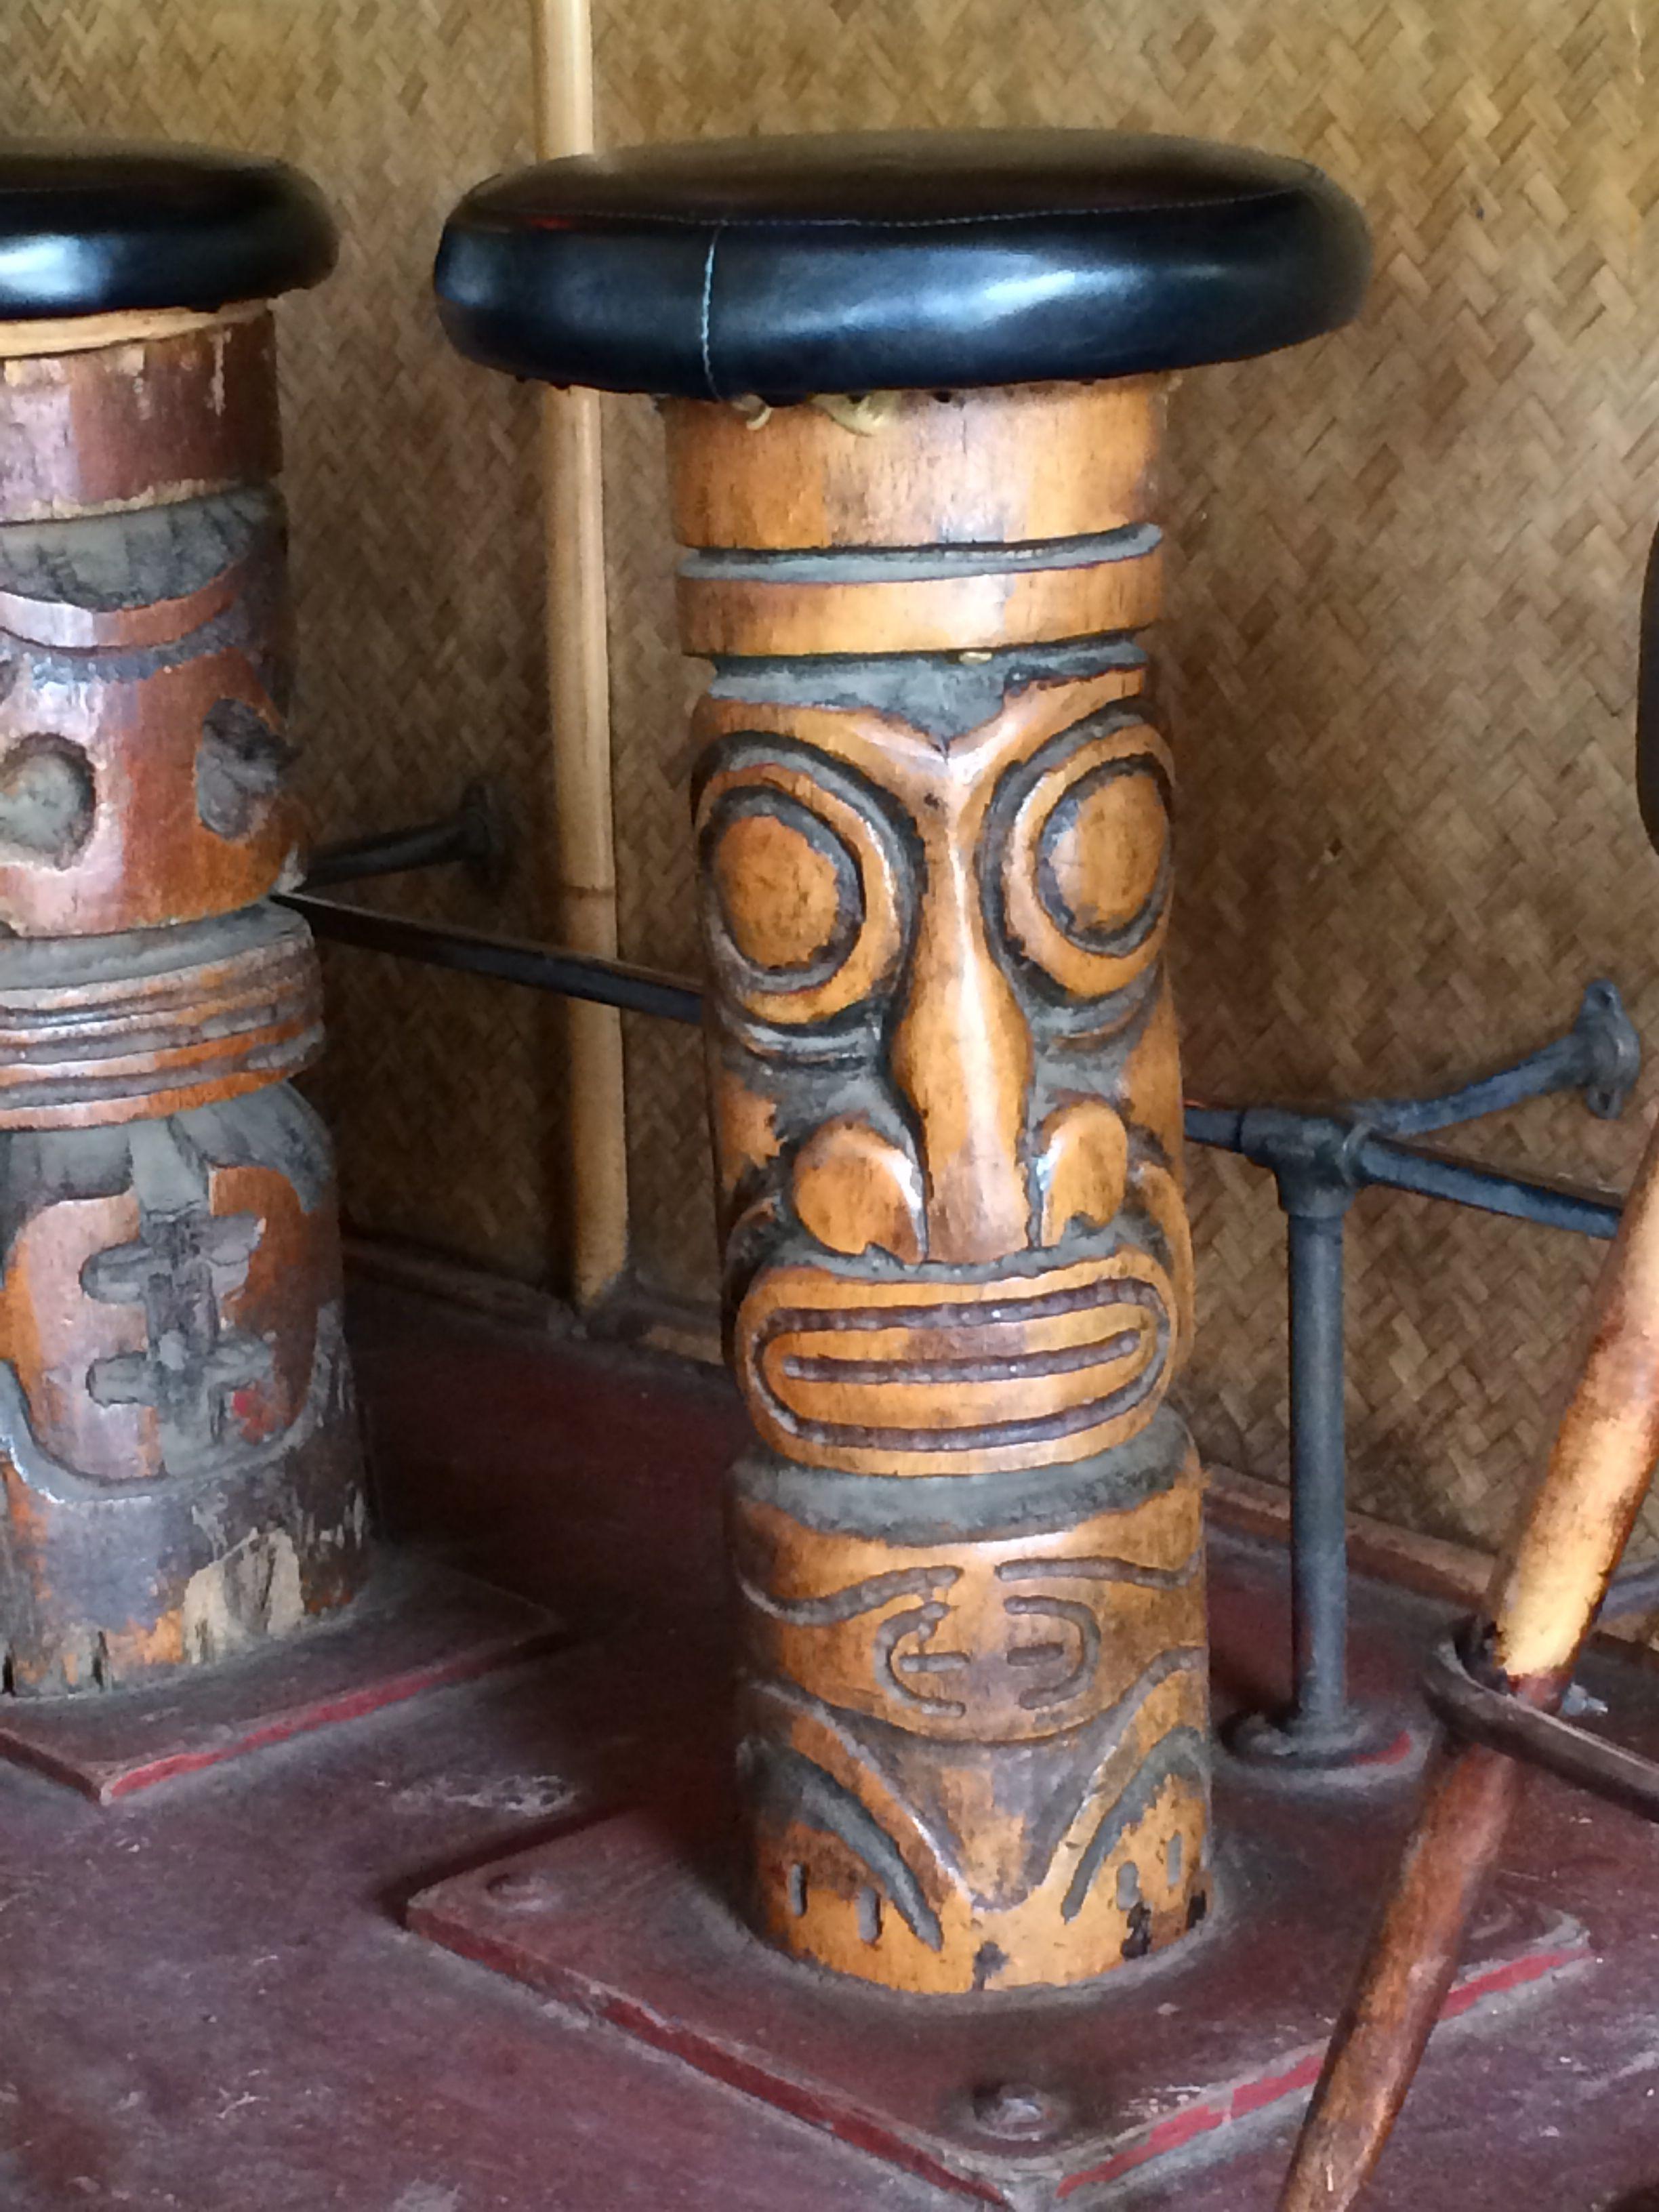 Awesome Tiki Bar Stools At Tahiti Nui Lovely Places